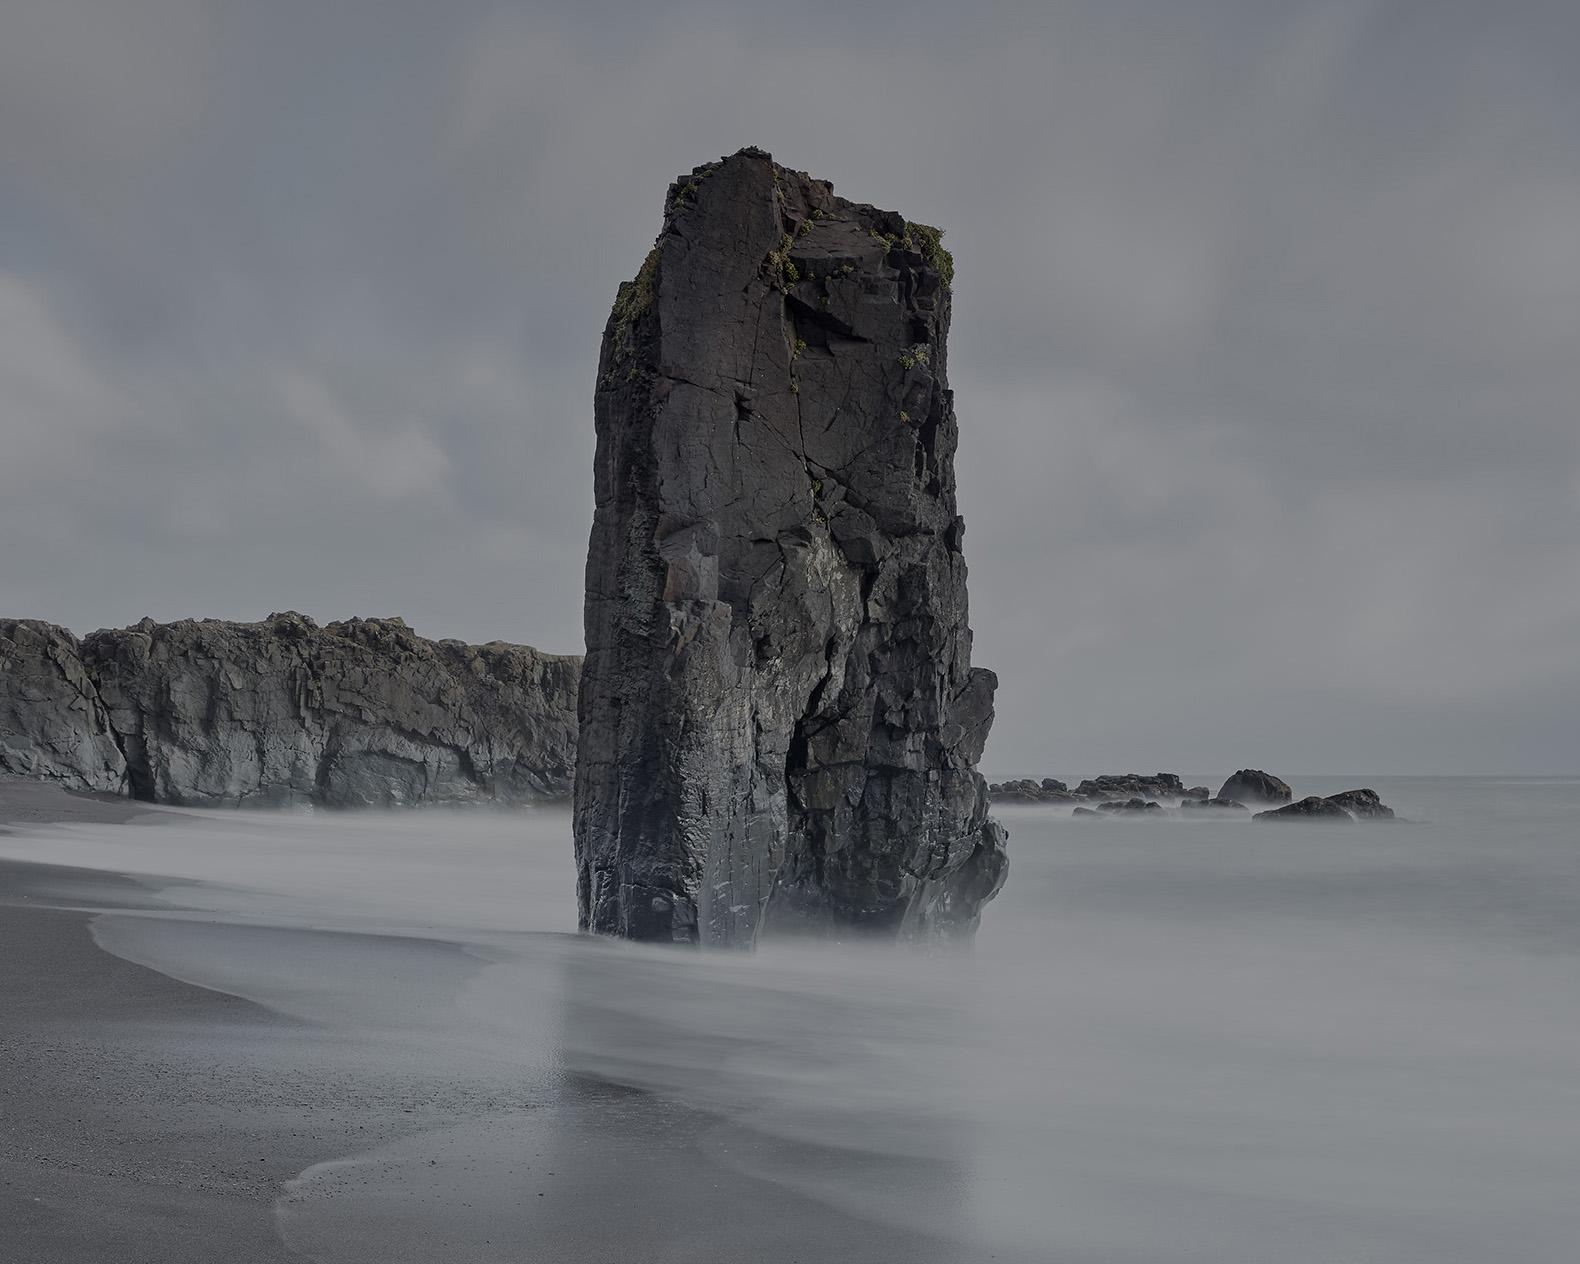 Patrick_Schuttler_Landscape_002.jpg